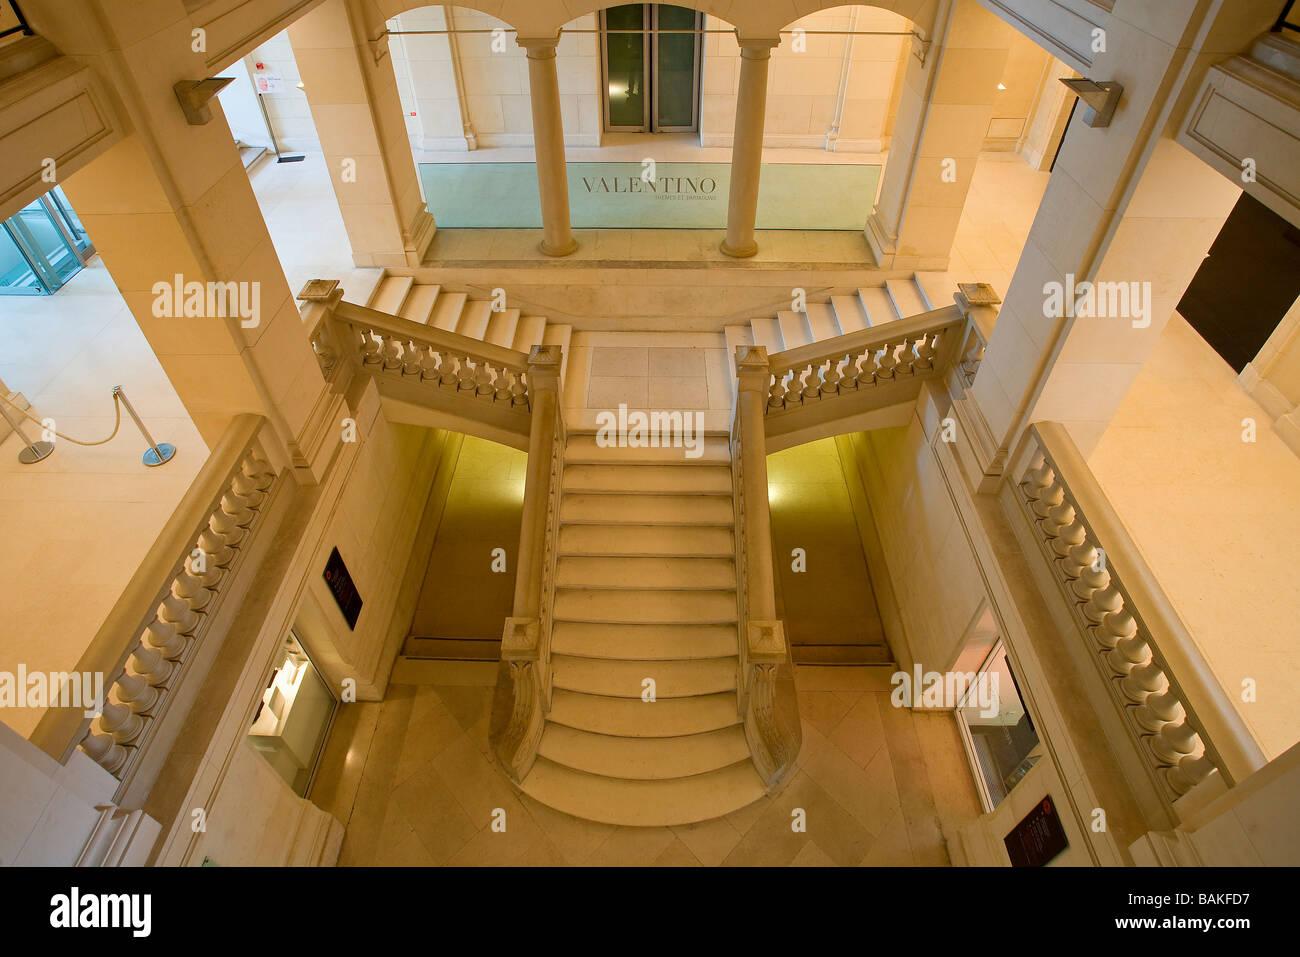 França, Paris , Musee des Arts Decoratifs (Museu de Artes ... on